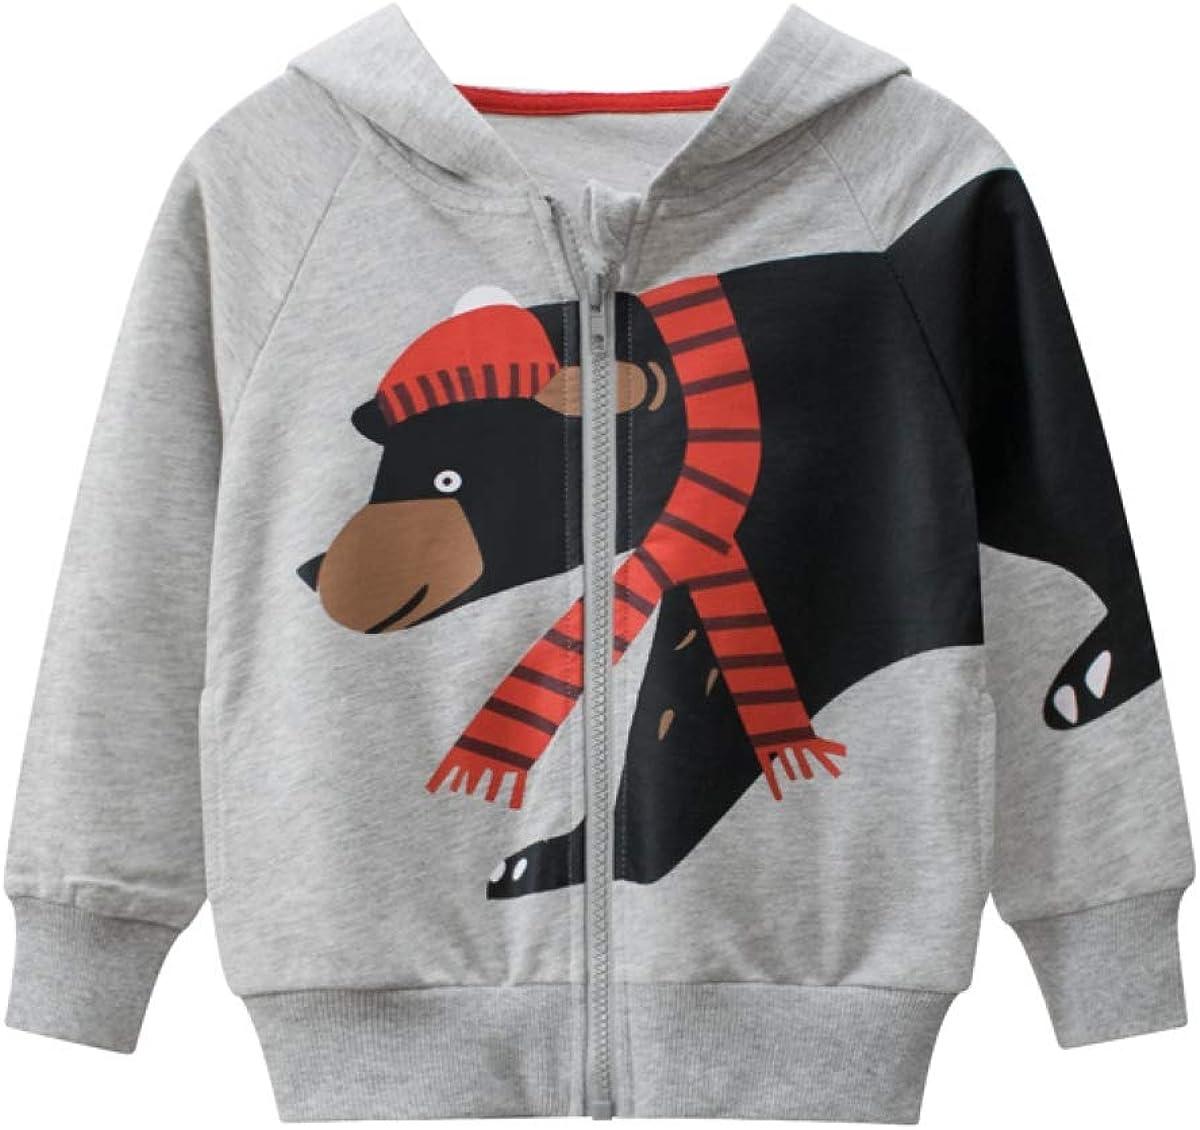 LeeXiang Toddler Max 83% OFF Boys Full Zip Dinosaur Swea Comfortable shipfree Hoodies